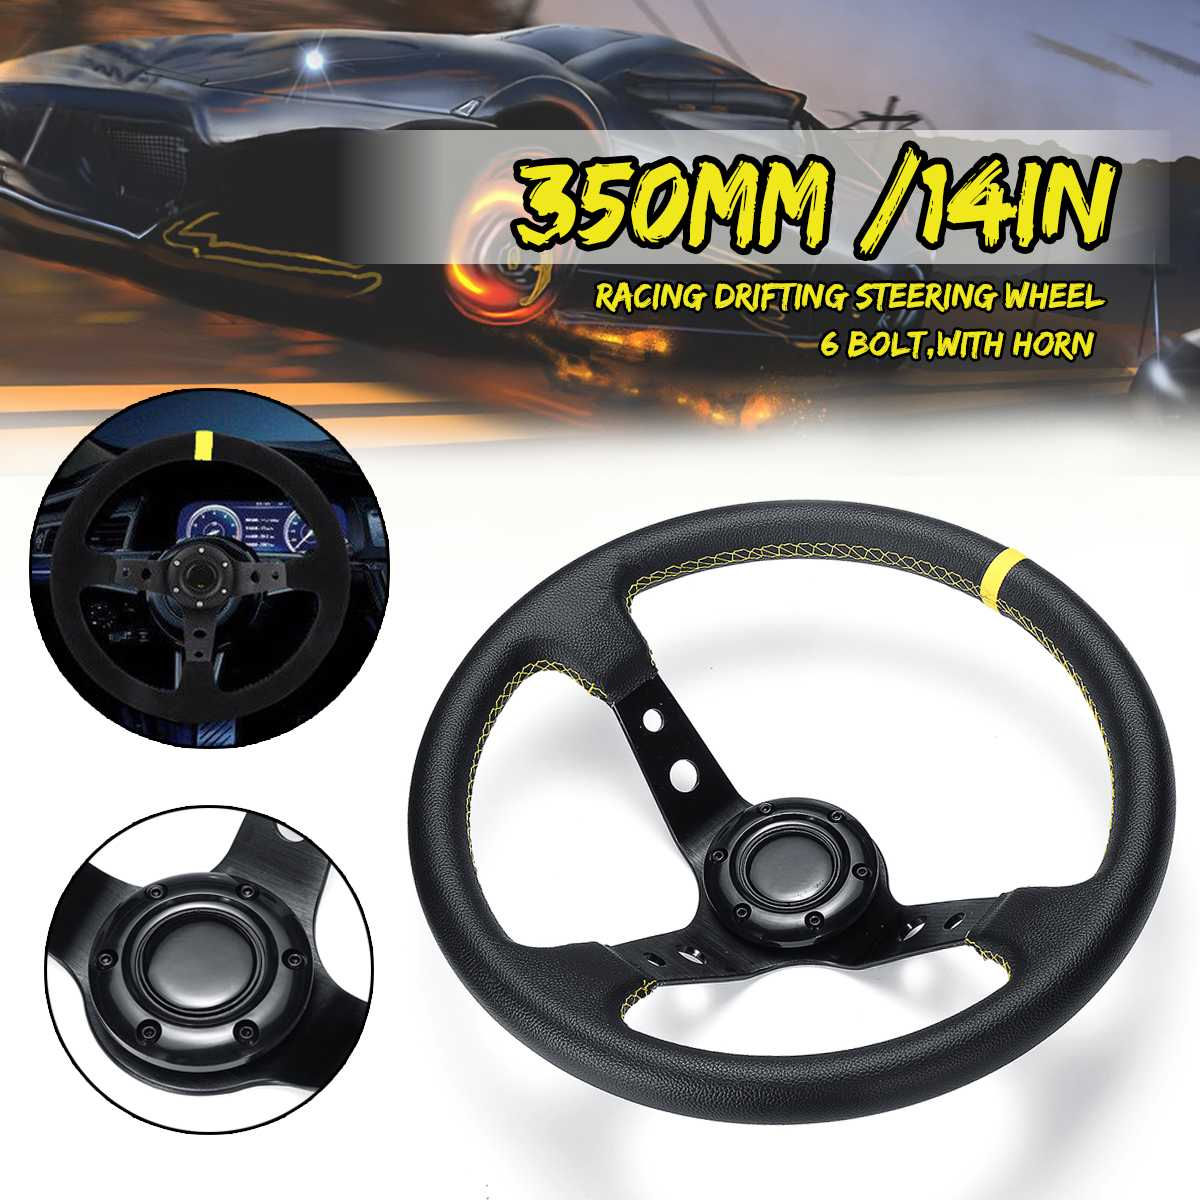 14inch 350mm Deep Dish Drifting Steering Wheel Kit Universal Leather Aluminum Car Auto Racing Sport Steering Wheel Accessories